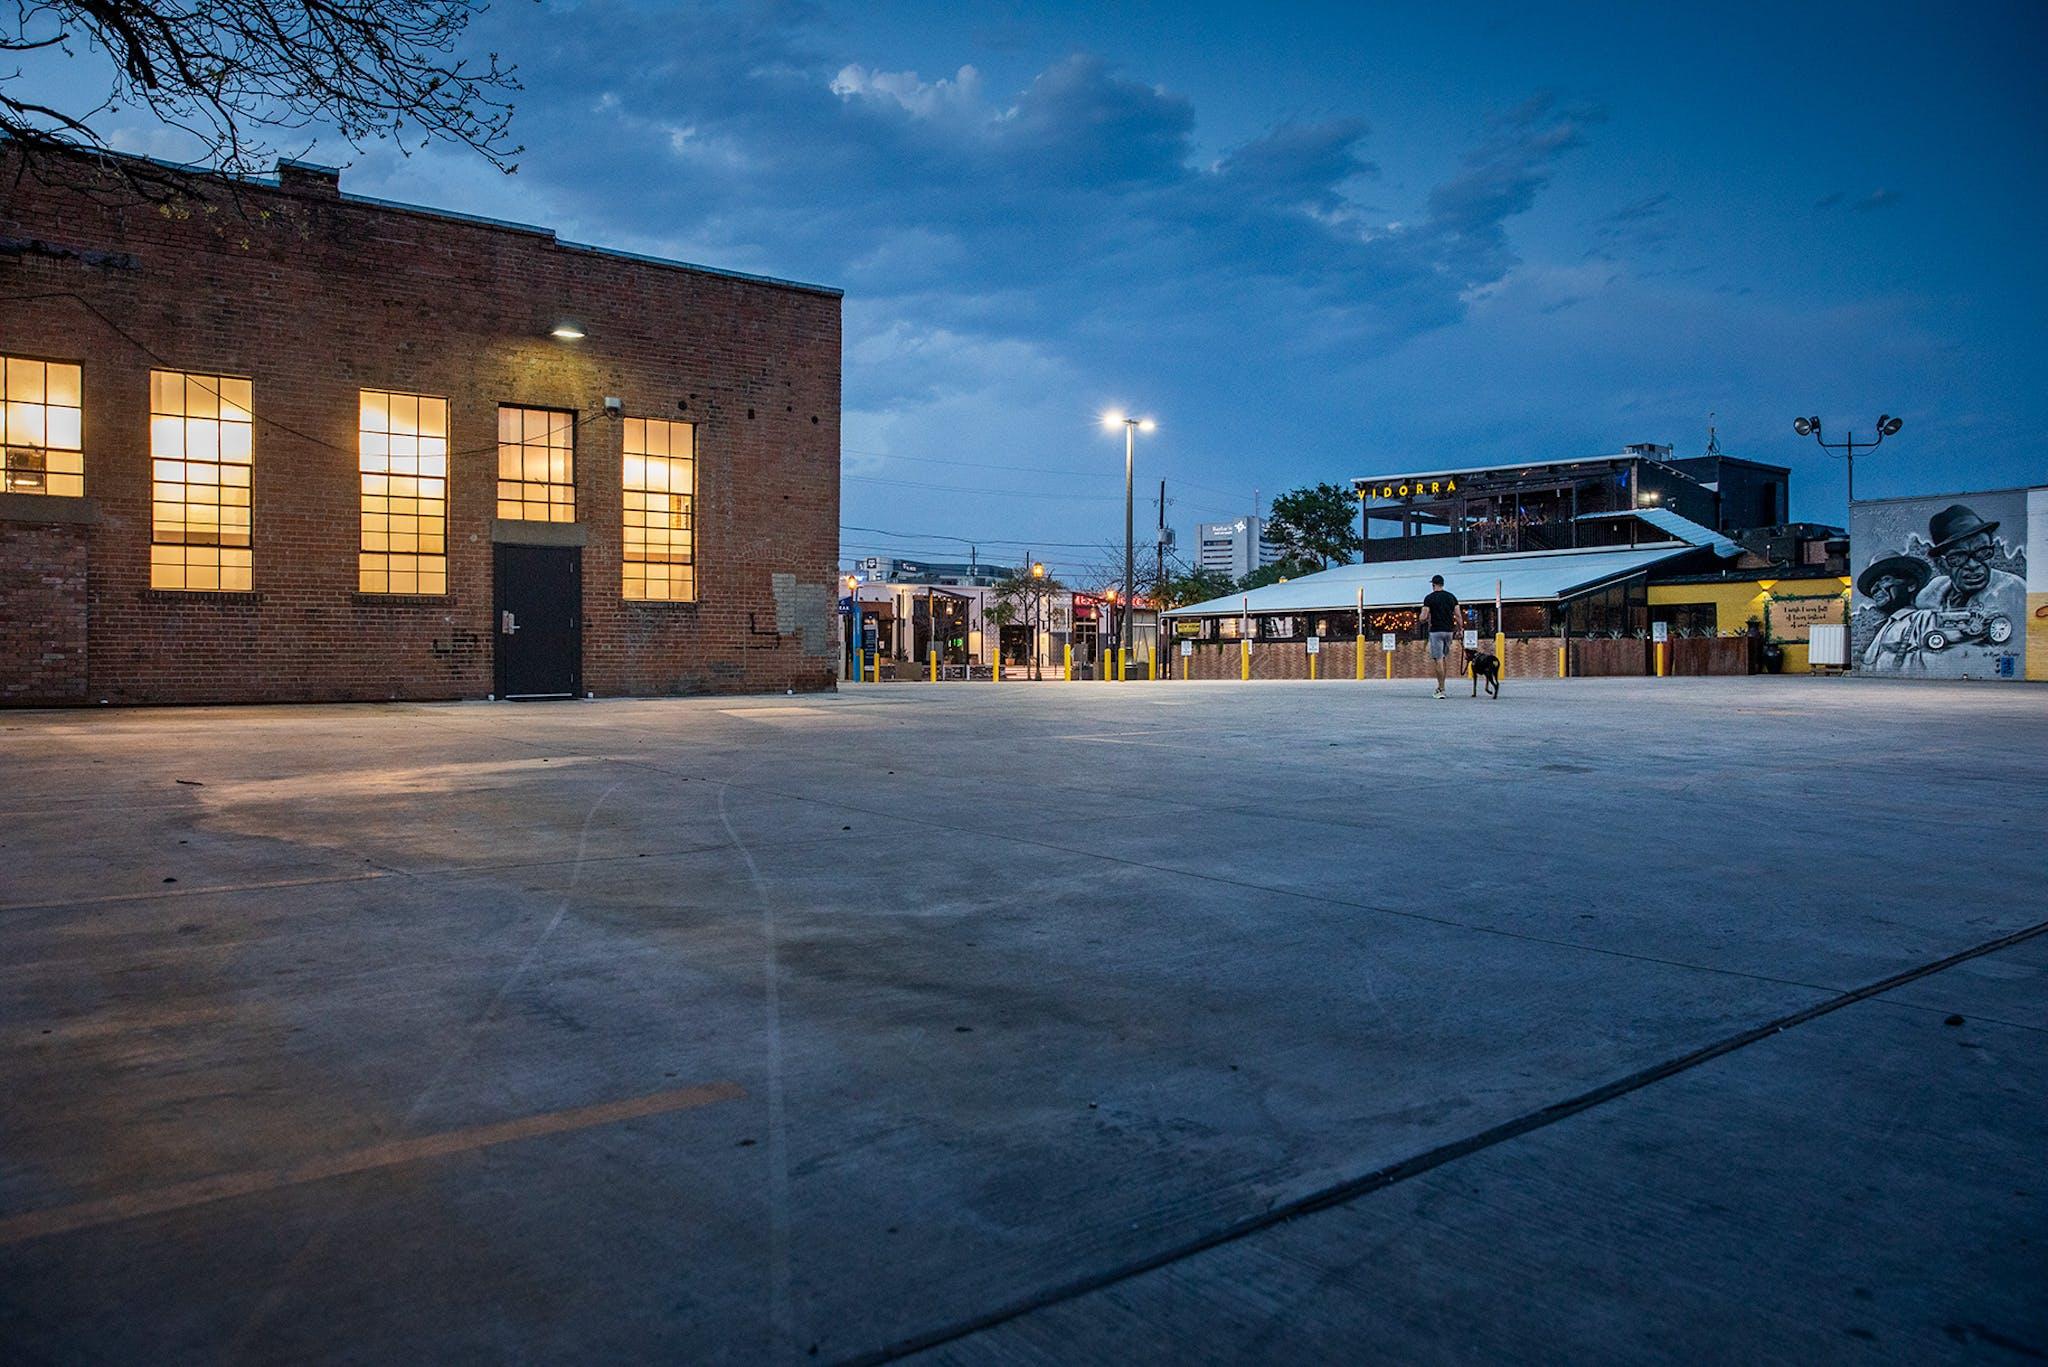 Dallas's Deep Ellum neighborhood, known for its nightlife, has gone quiet.